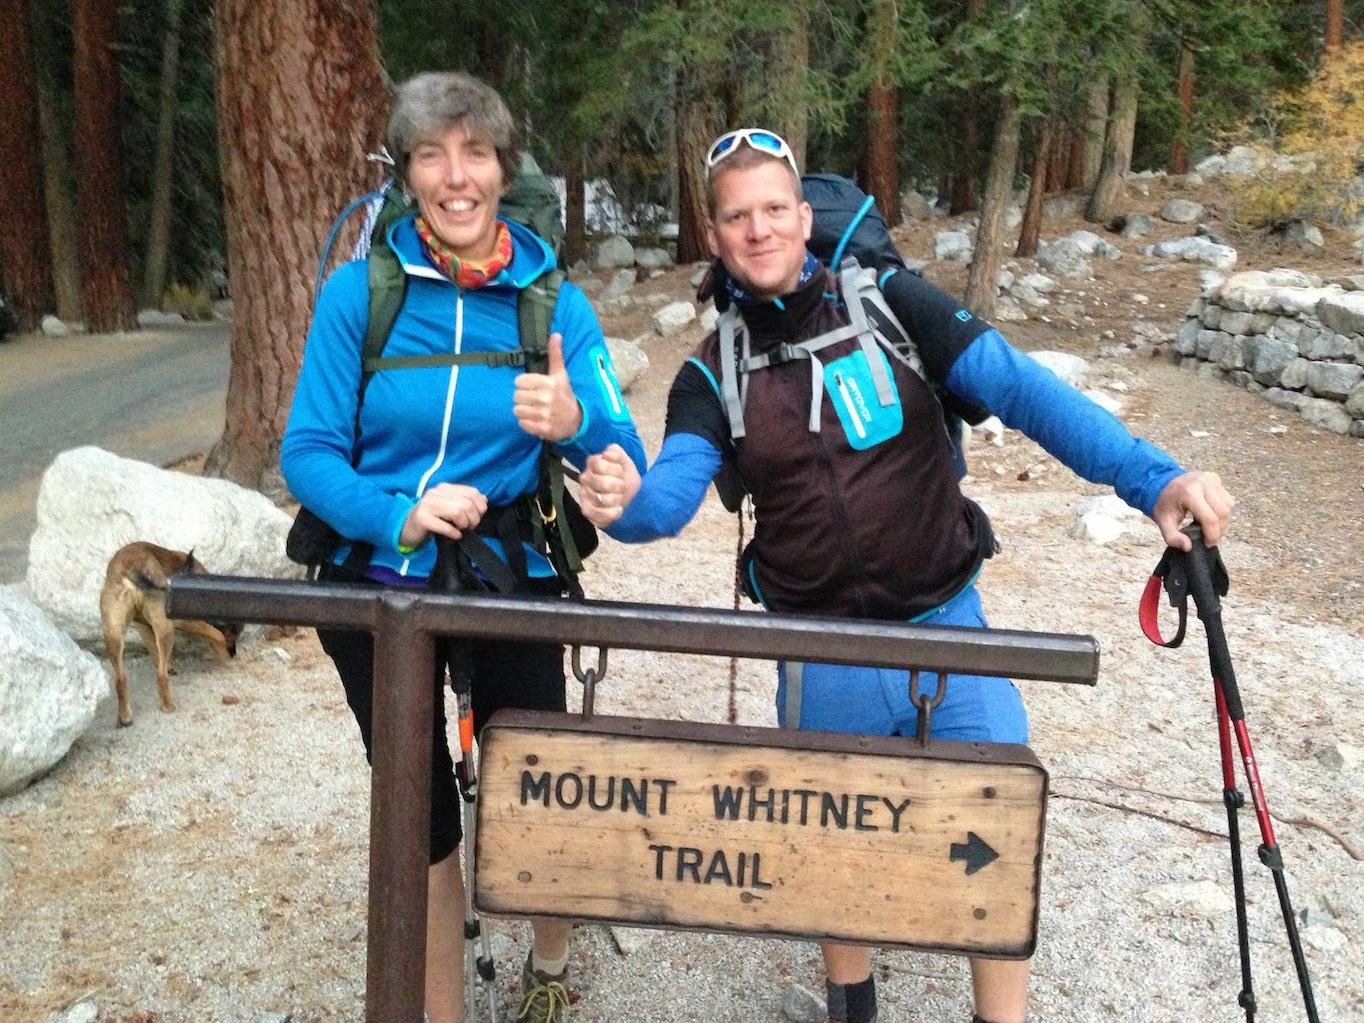 Gerdi and Stefan headed over Mt. Whitney to do the John Muir Trail nobo starting in mid October.